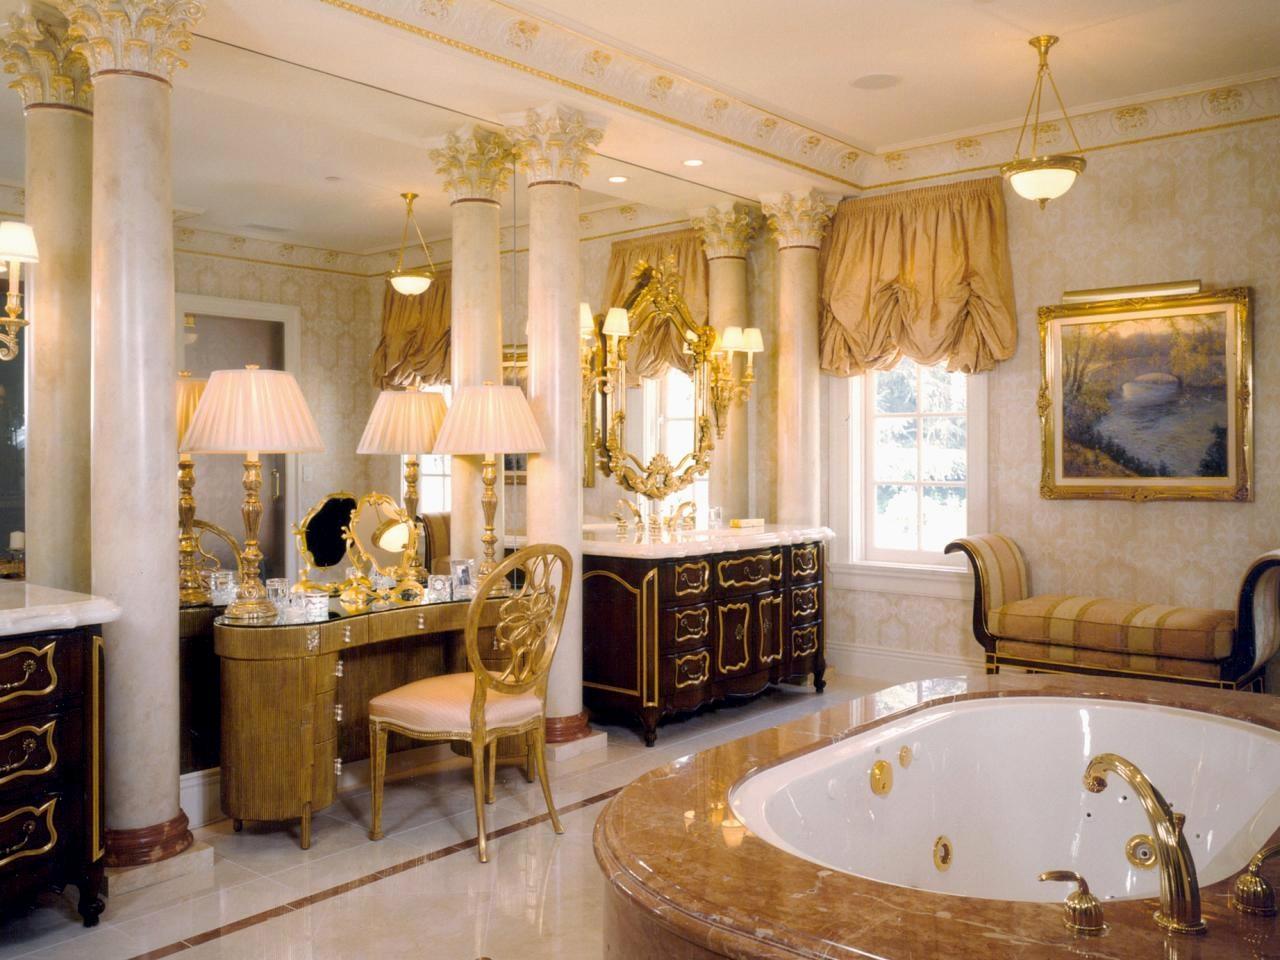 Extravagant guldbad